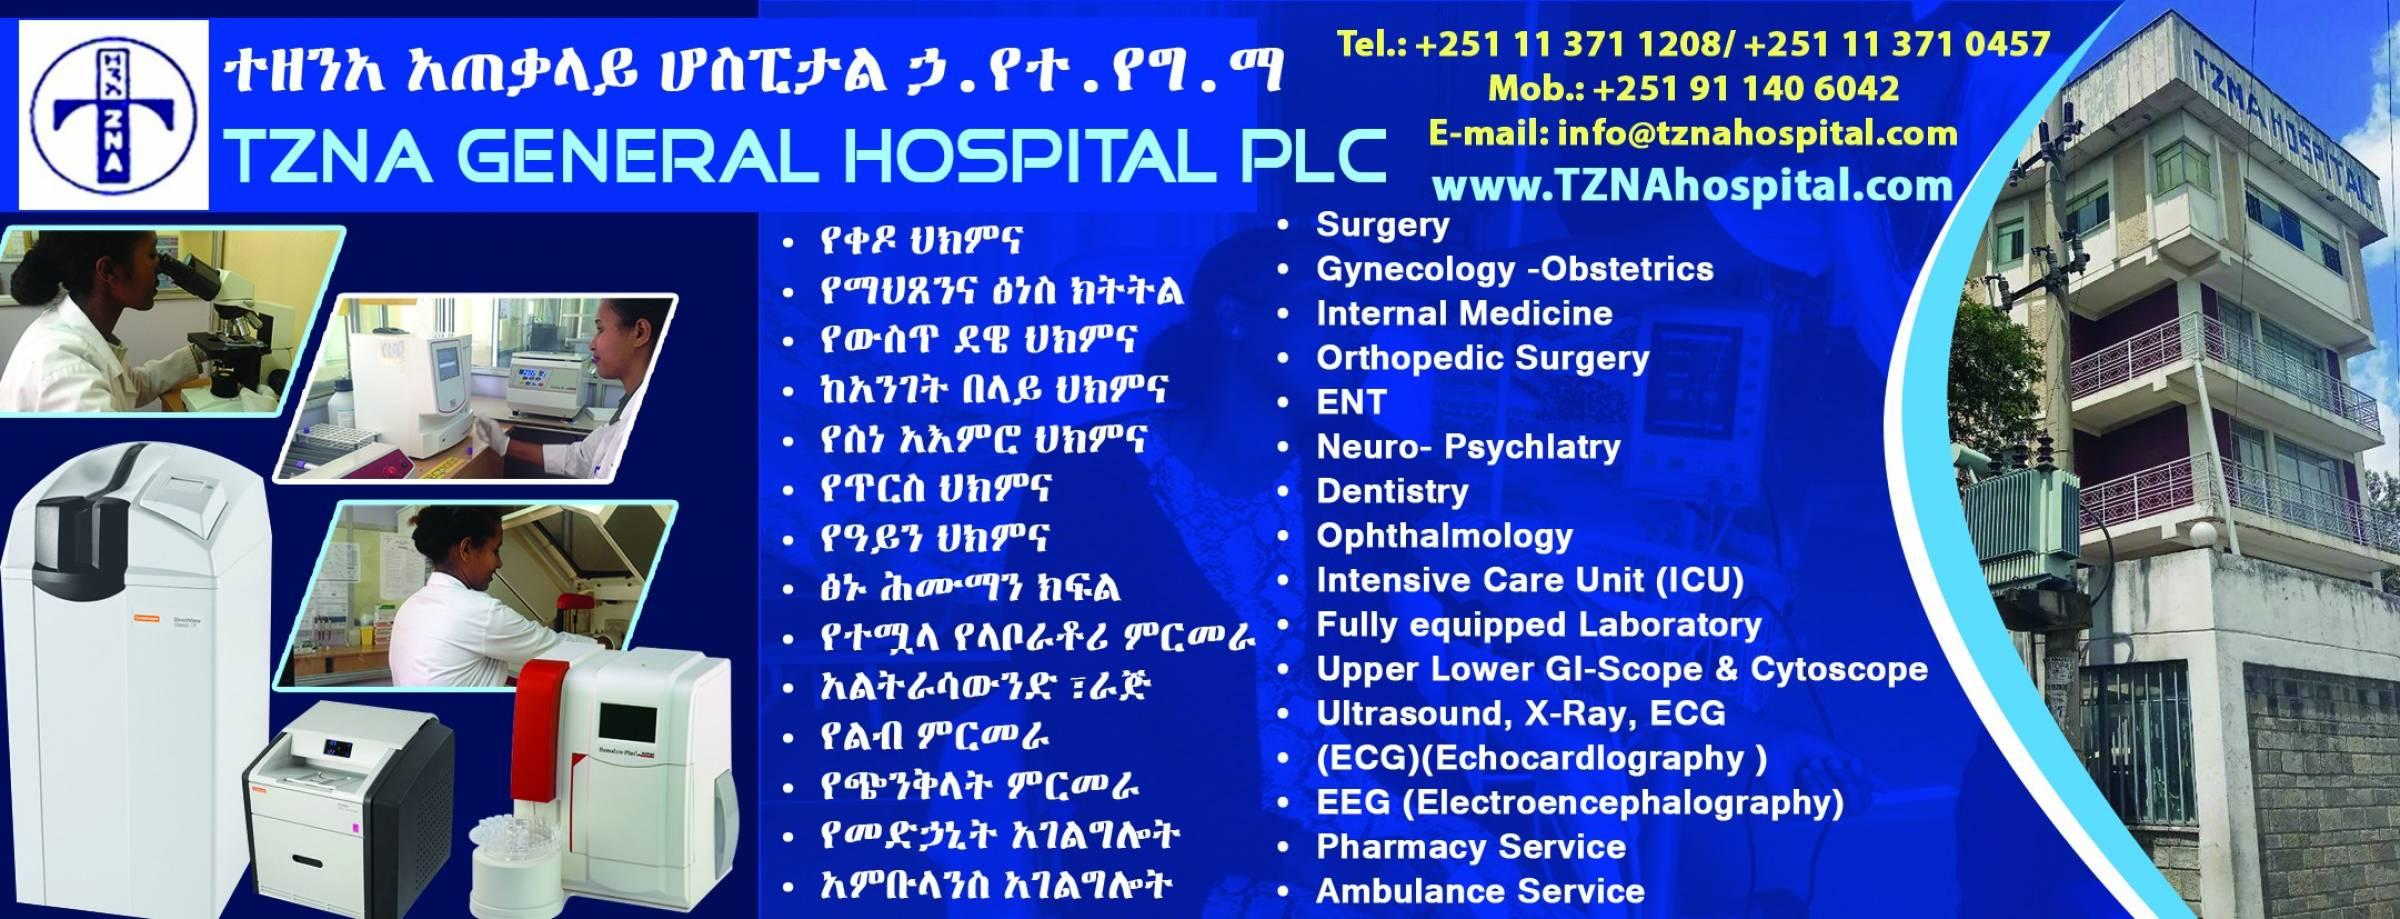 TZNA General Hospital PLC